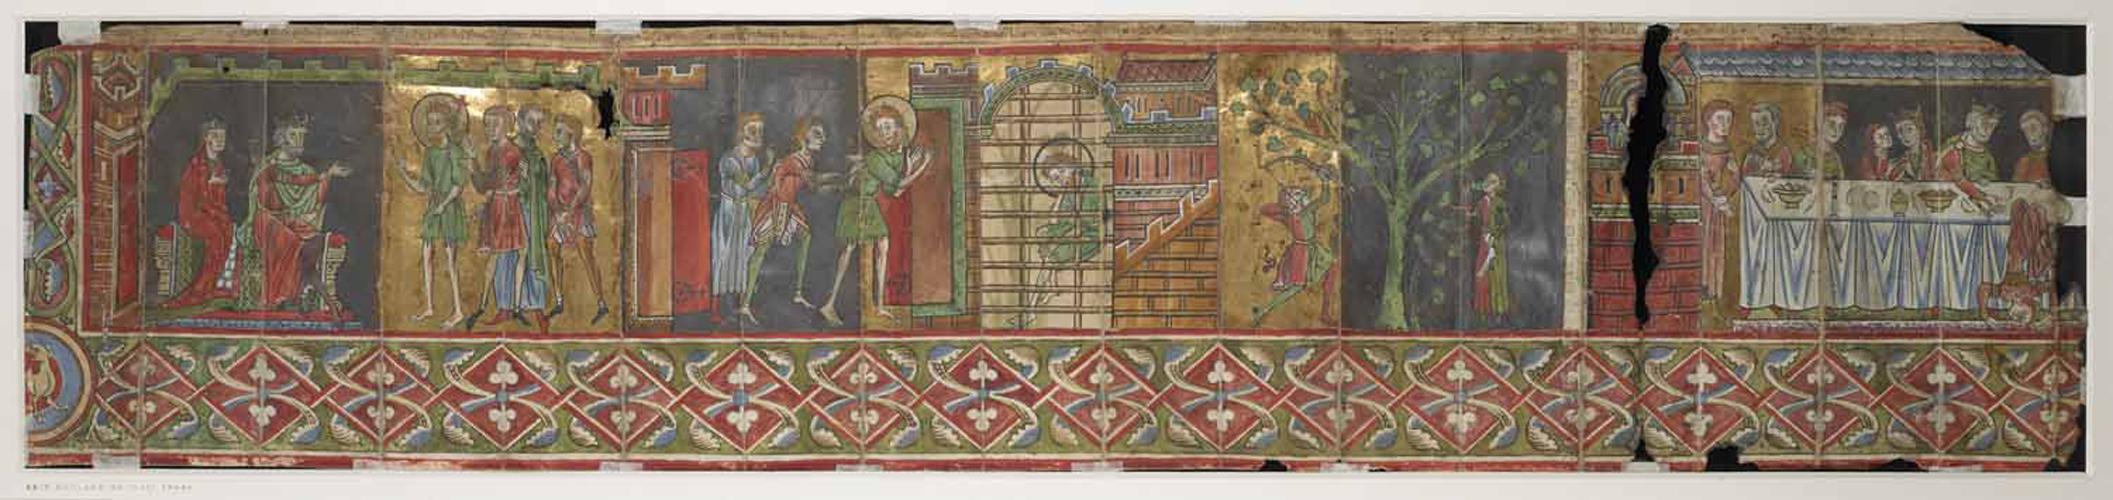 The life of John the Baptist, scenes 6-9